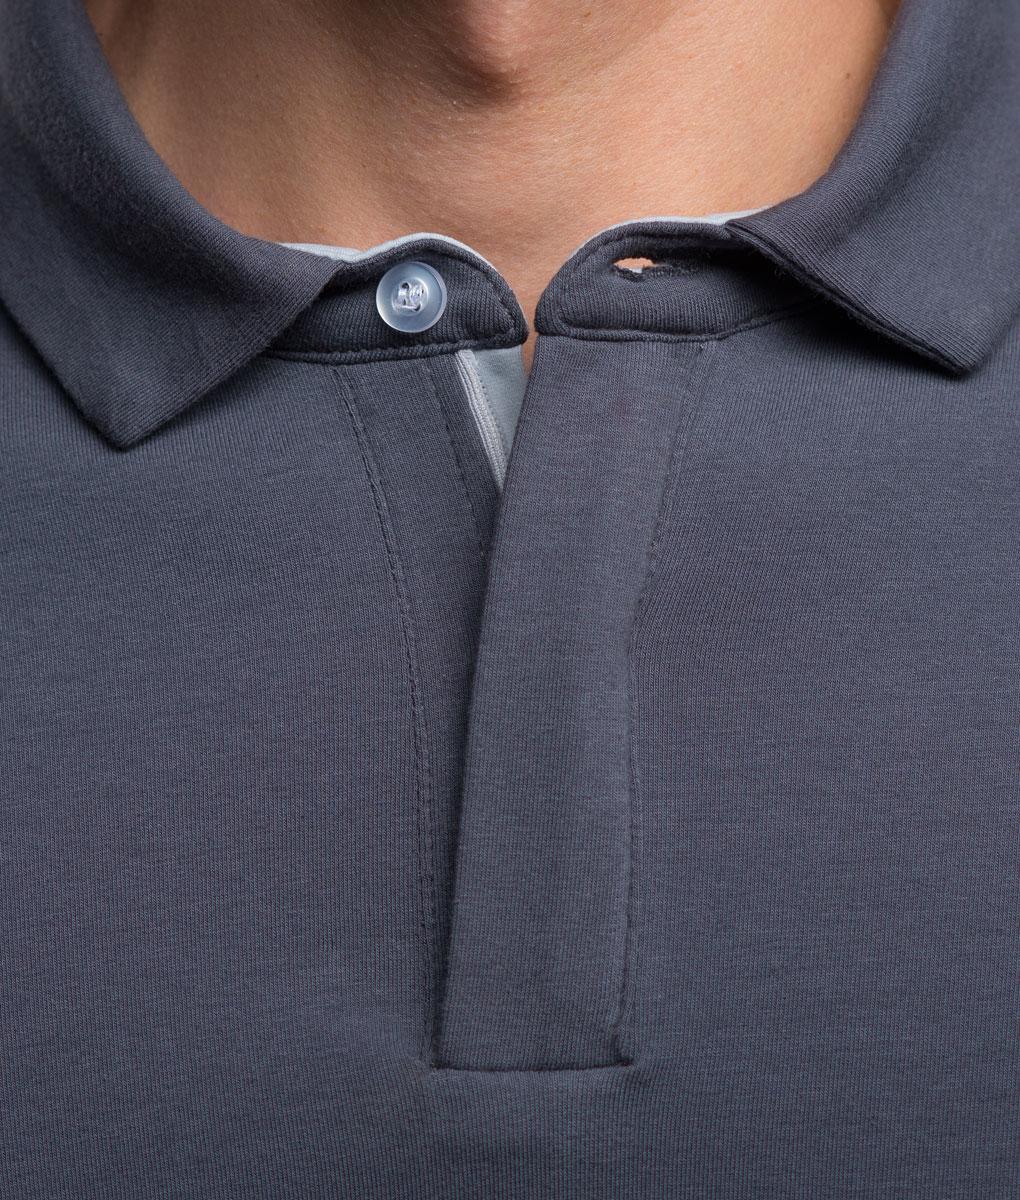 Transparent-casual-cycling-titanium-classic-polo-neck-detail